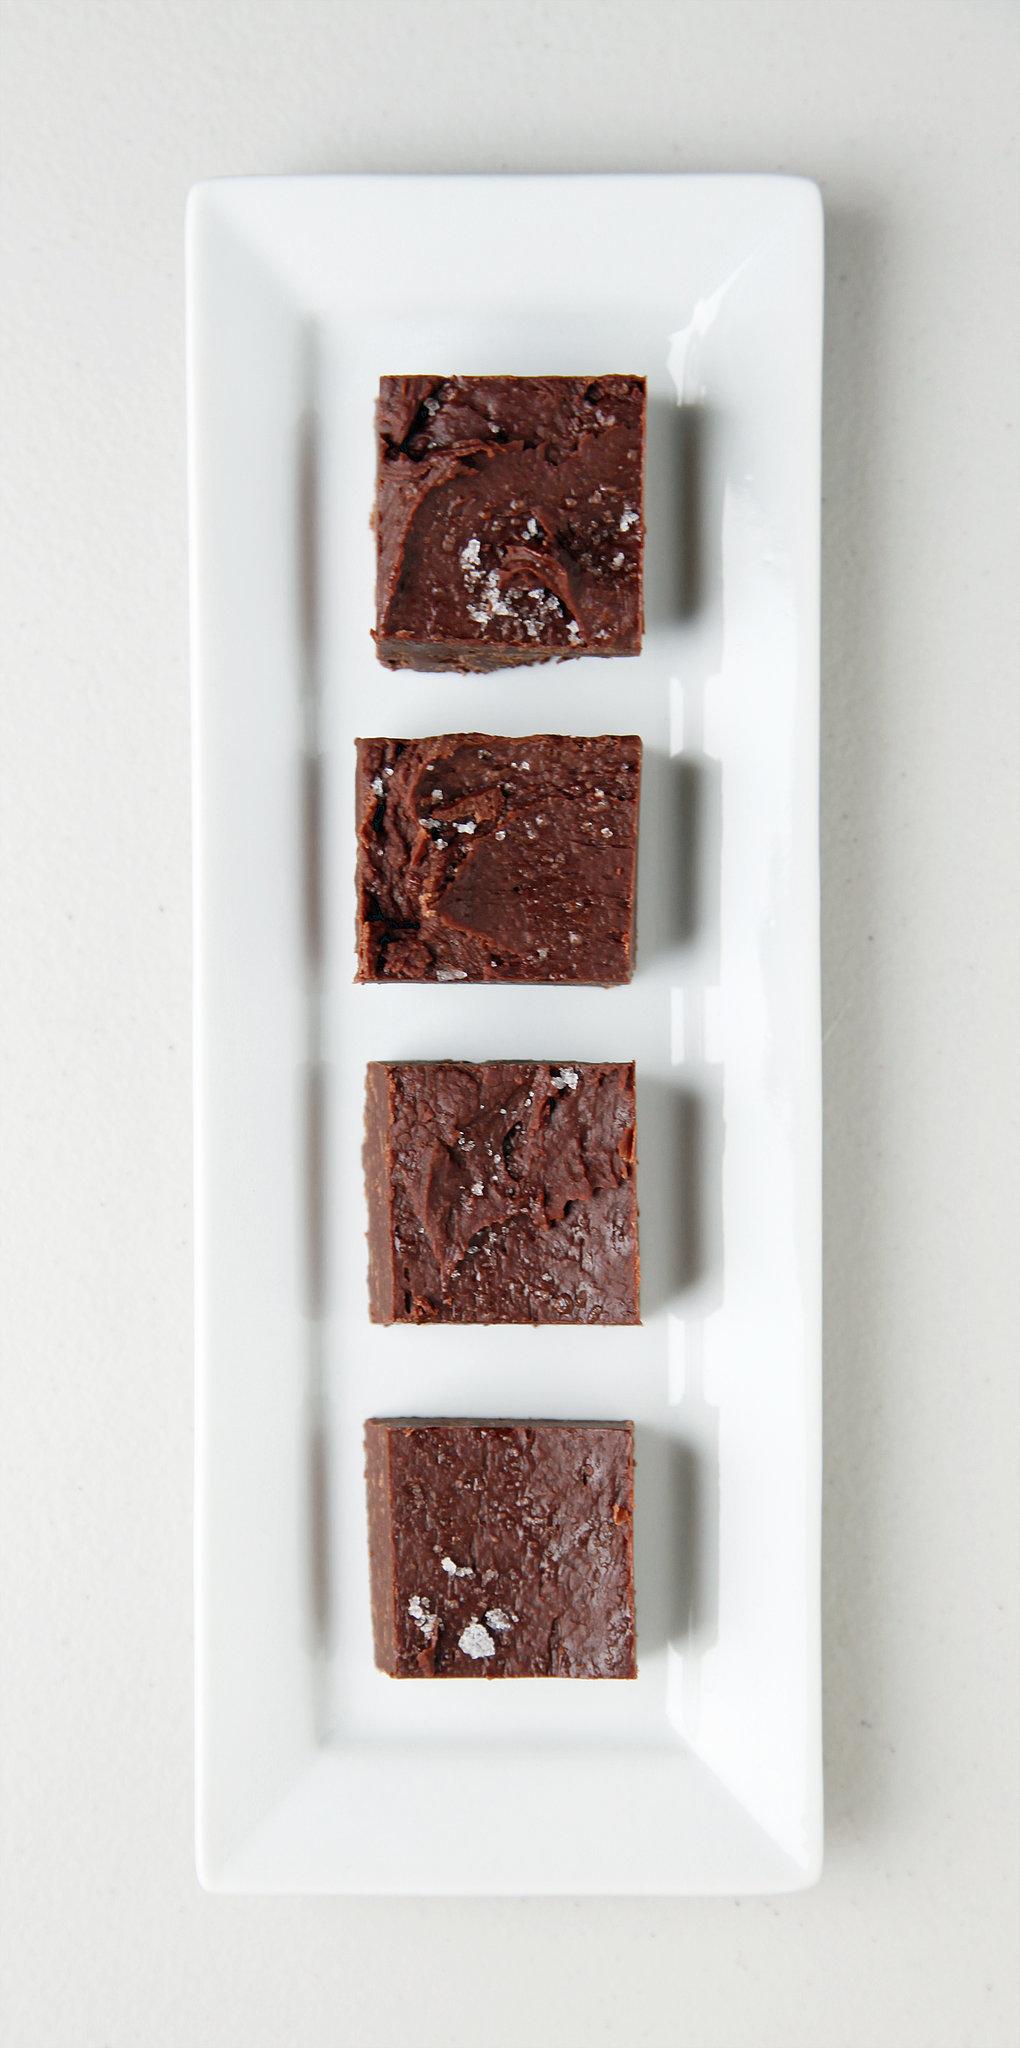 Chocolate Fudge Recipe | POPSUGAR Food